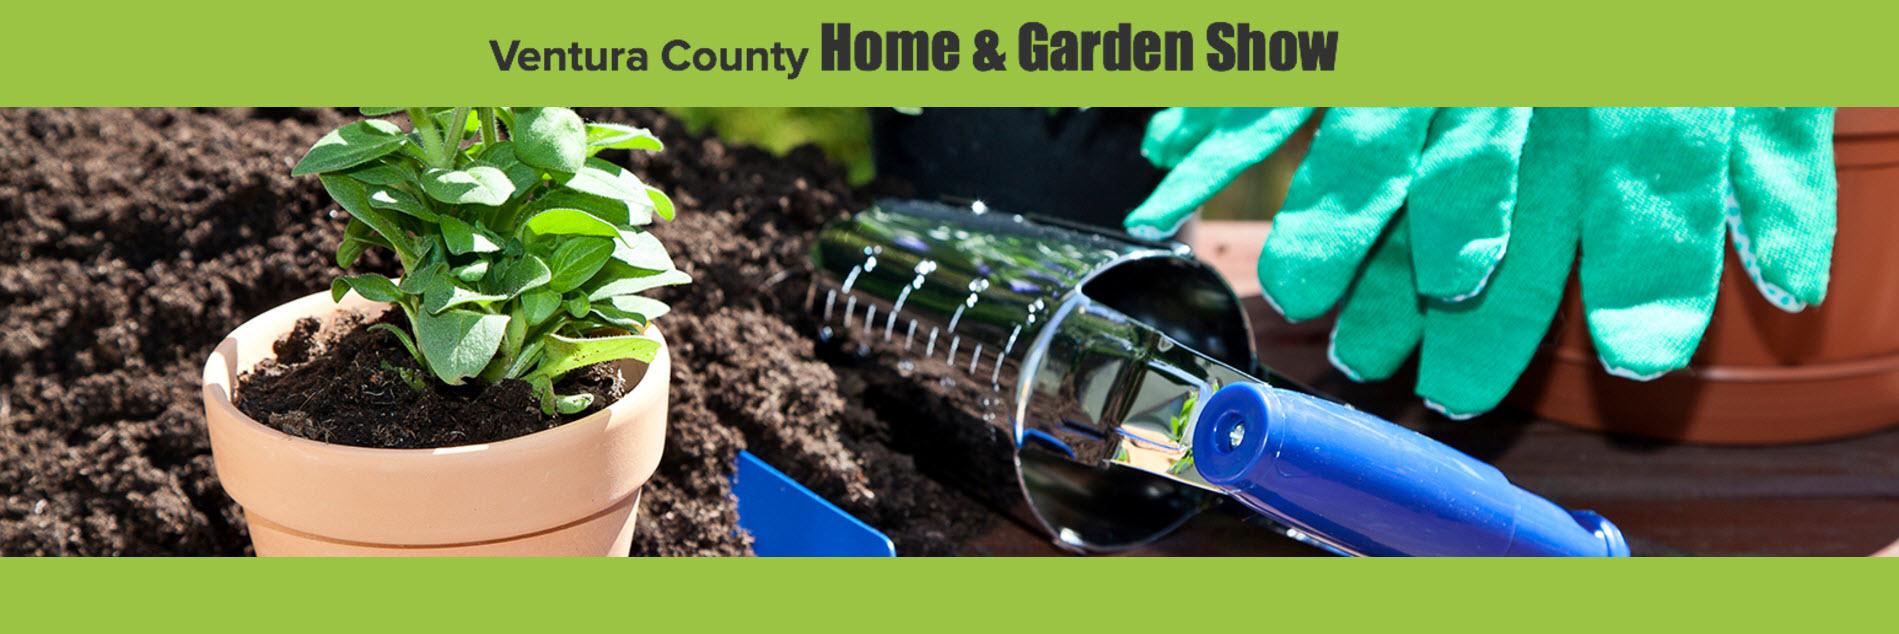 26th Annual Ventura Home and Garden Show